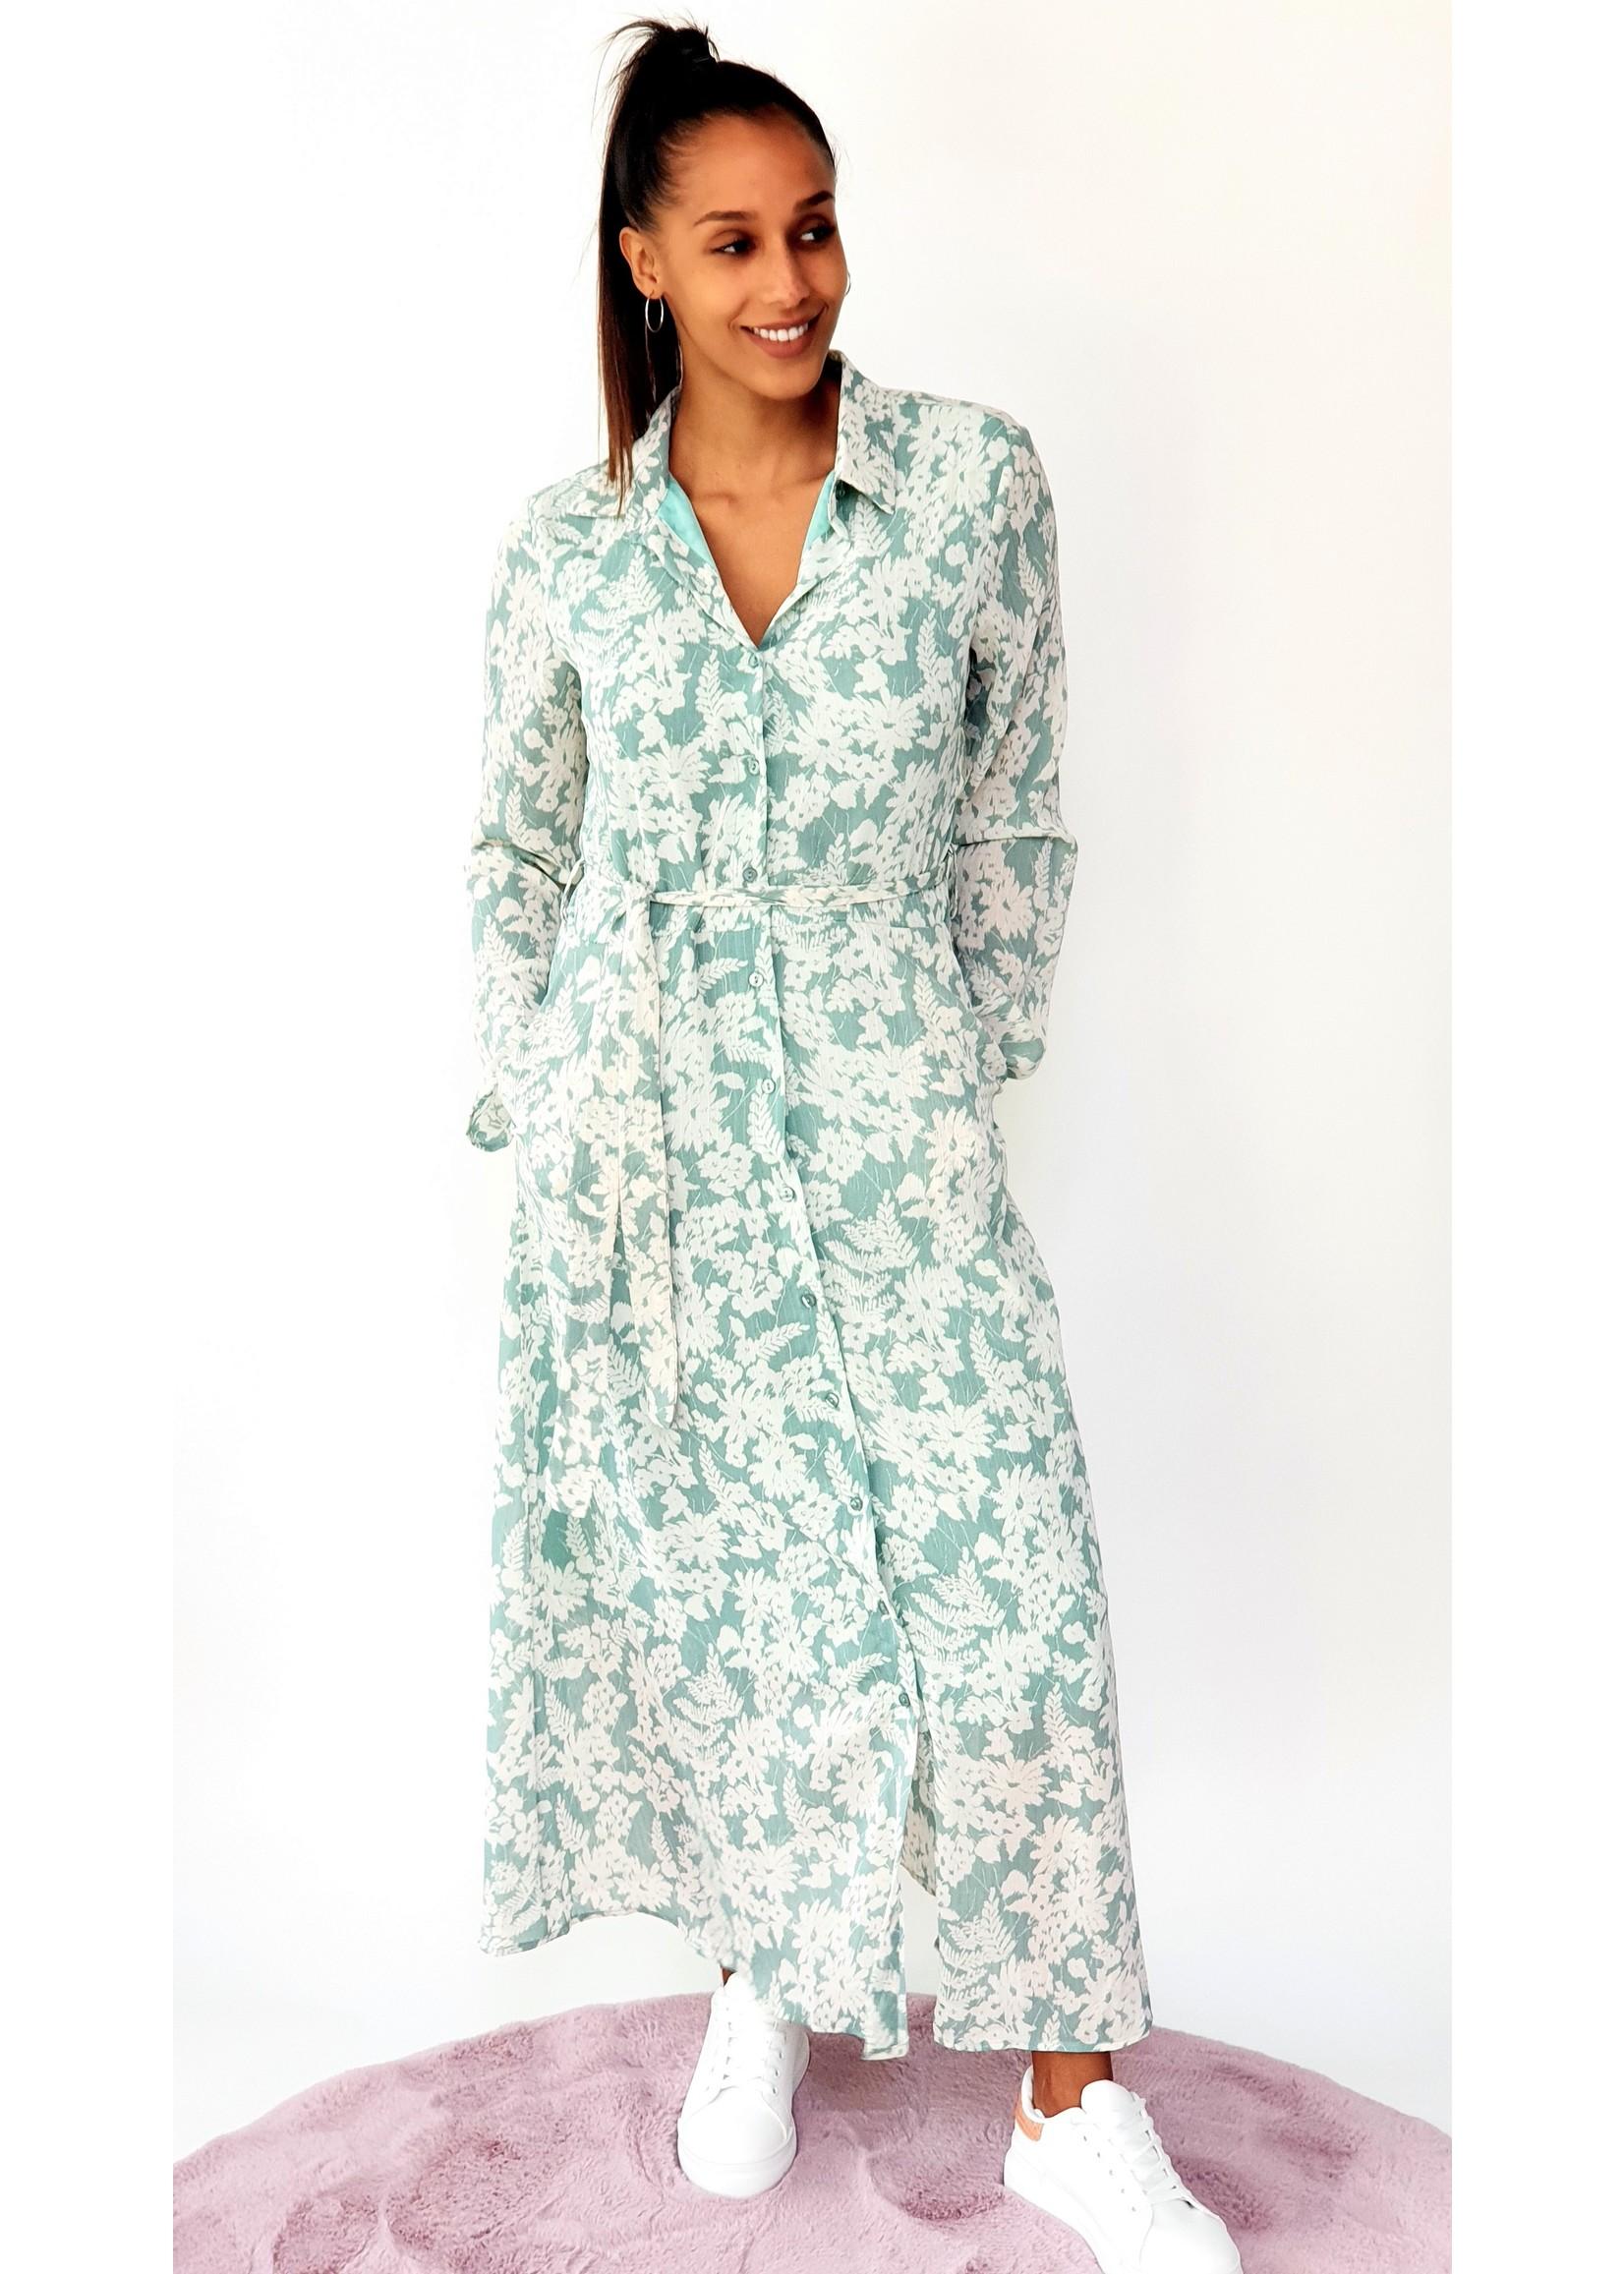 Thé cute floral dress